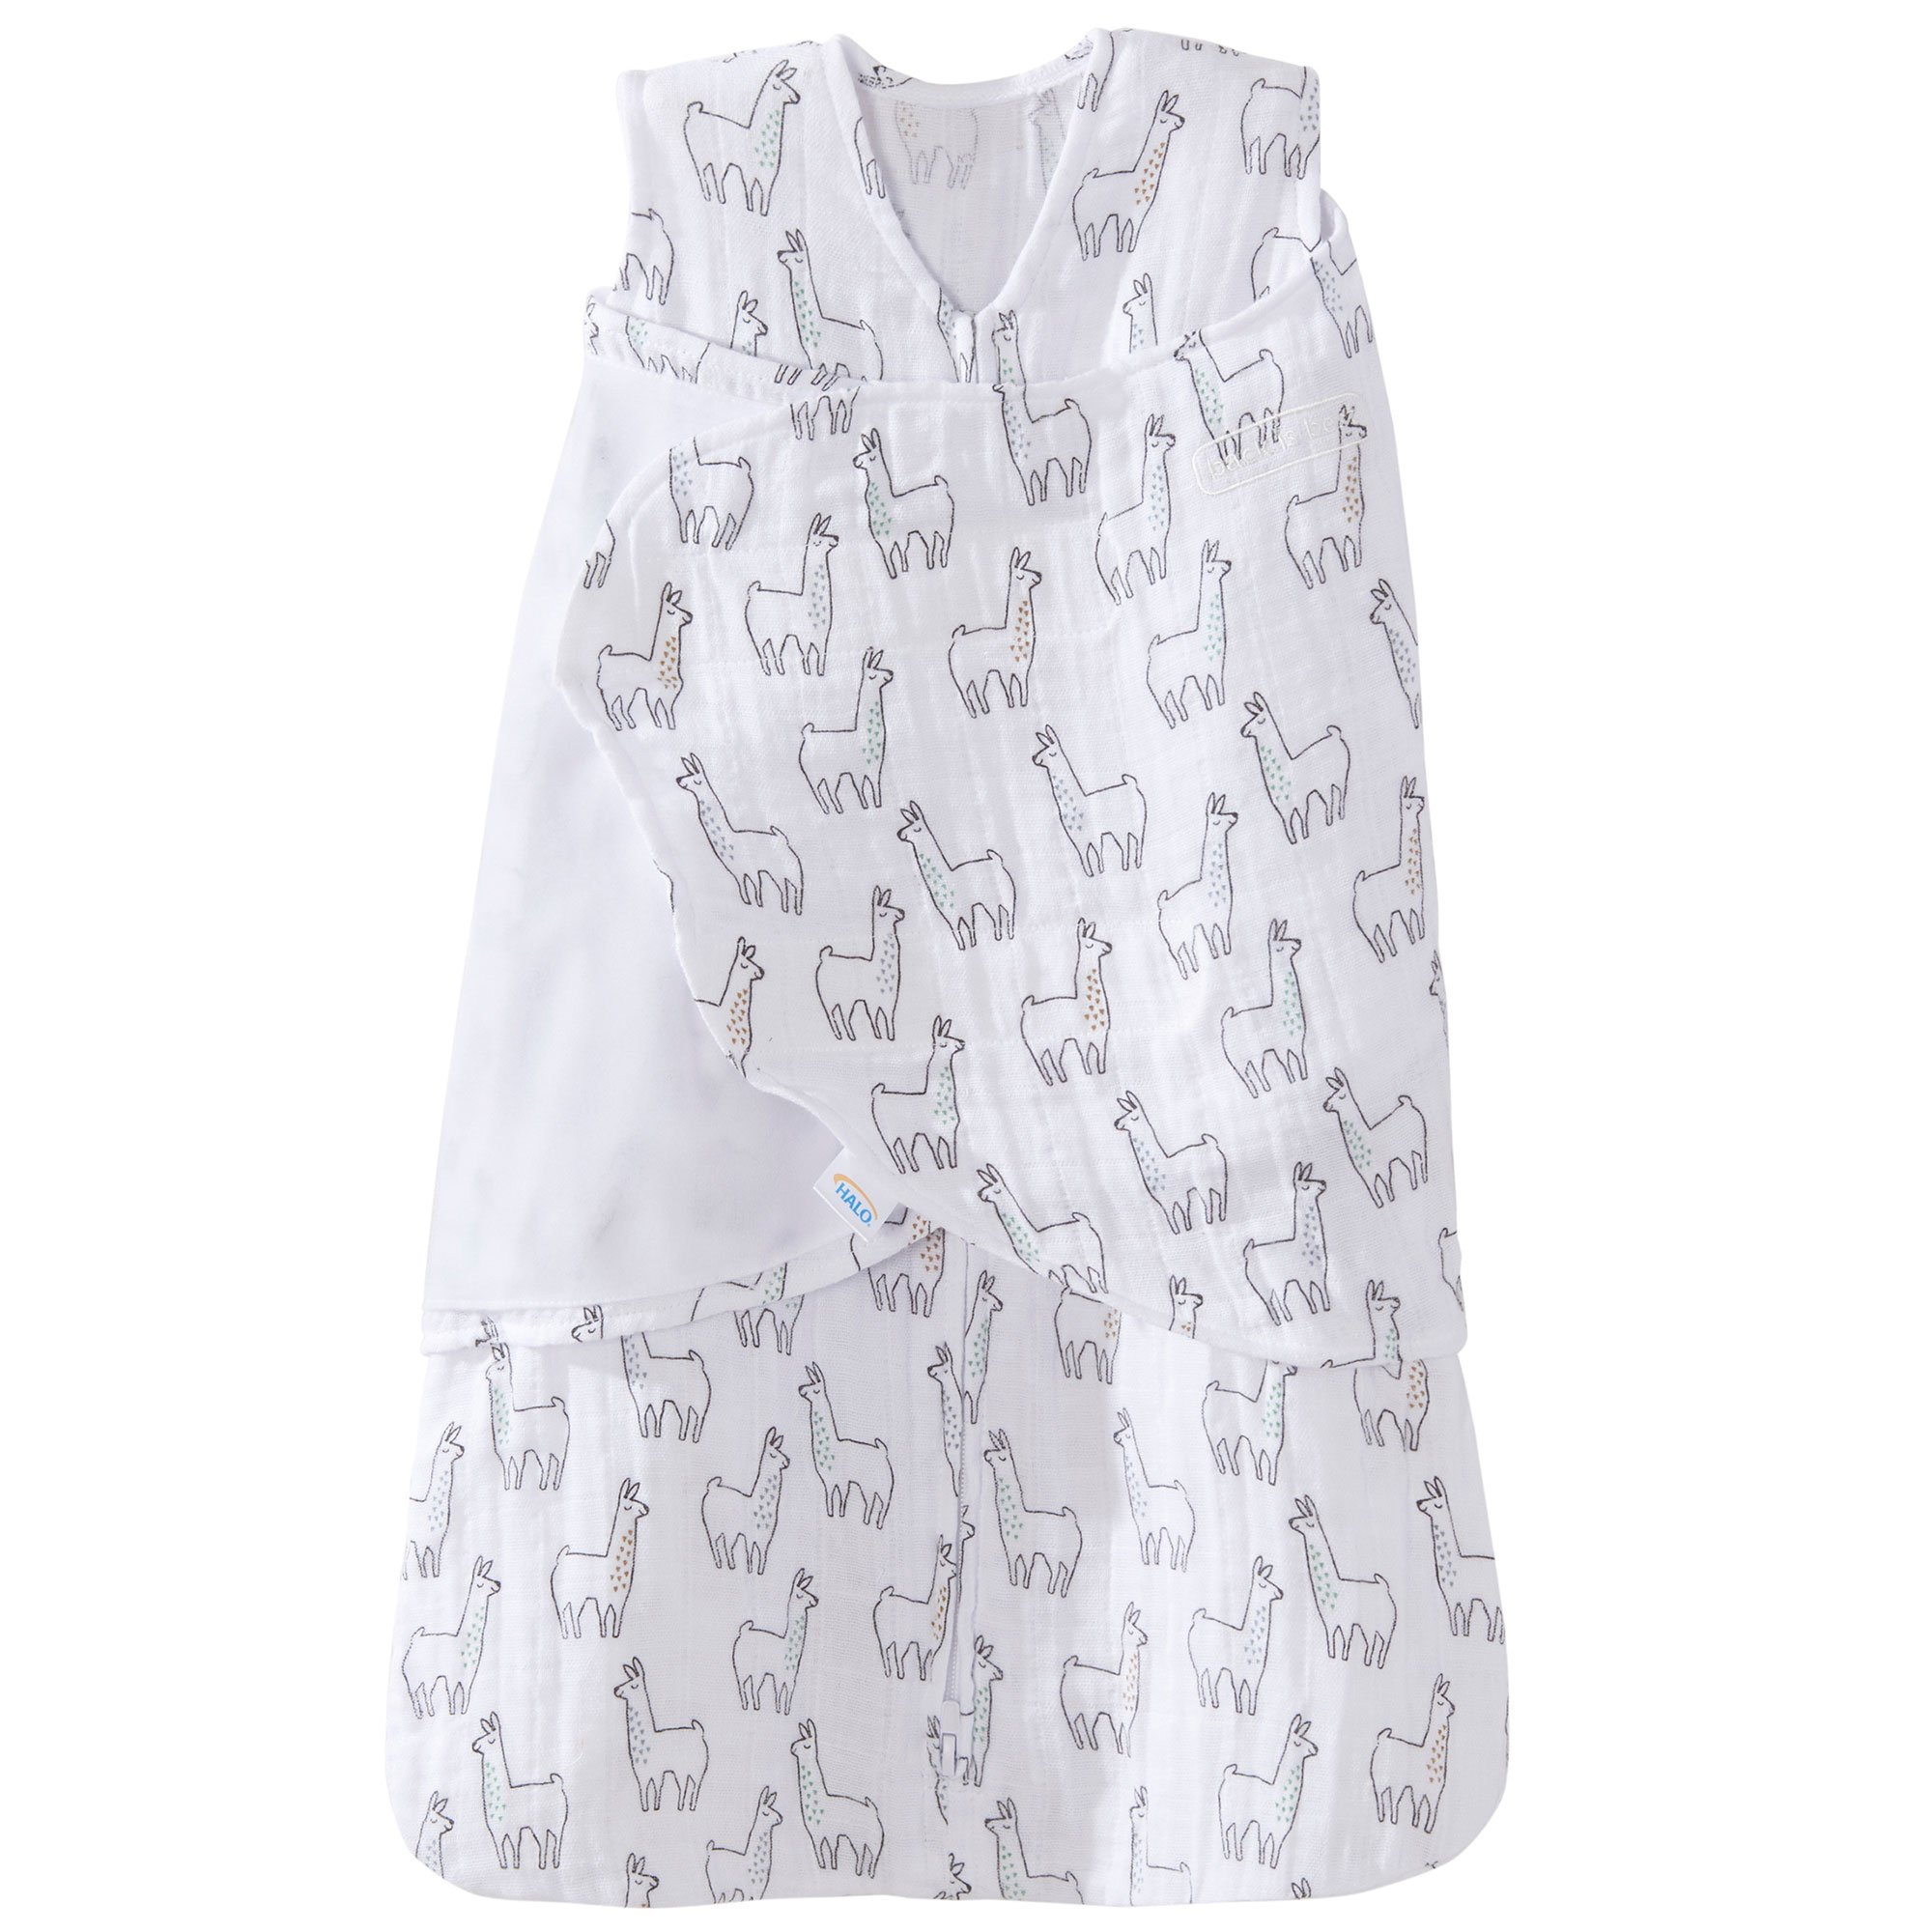 Halo 100% Cotton Muslin Sleepsack Swaddle Wearable Blanket, Llama Print, Small by Halo